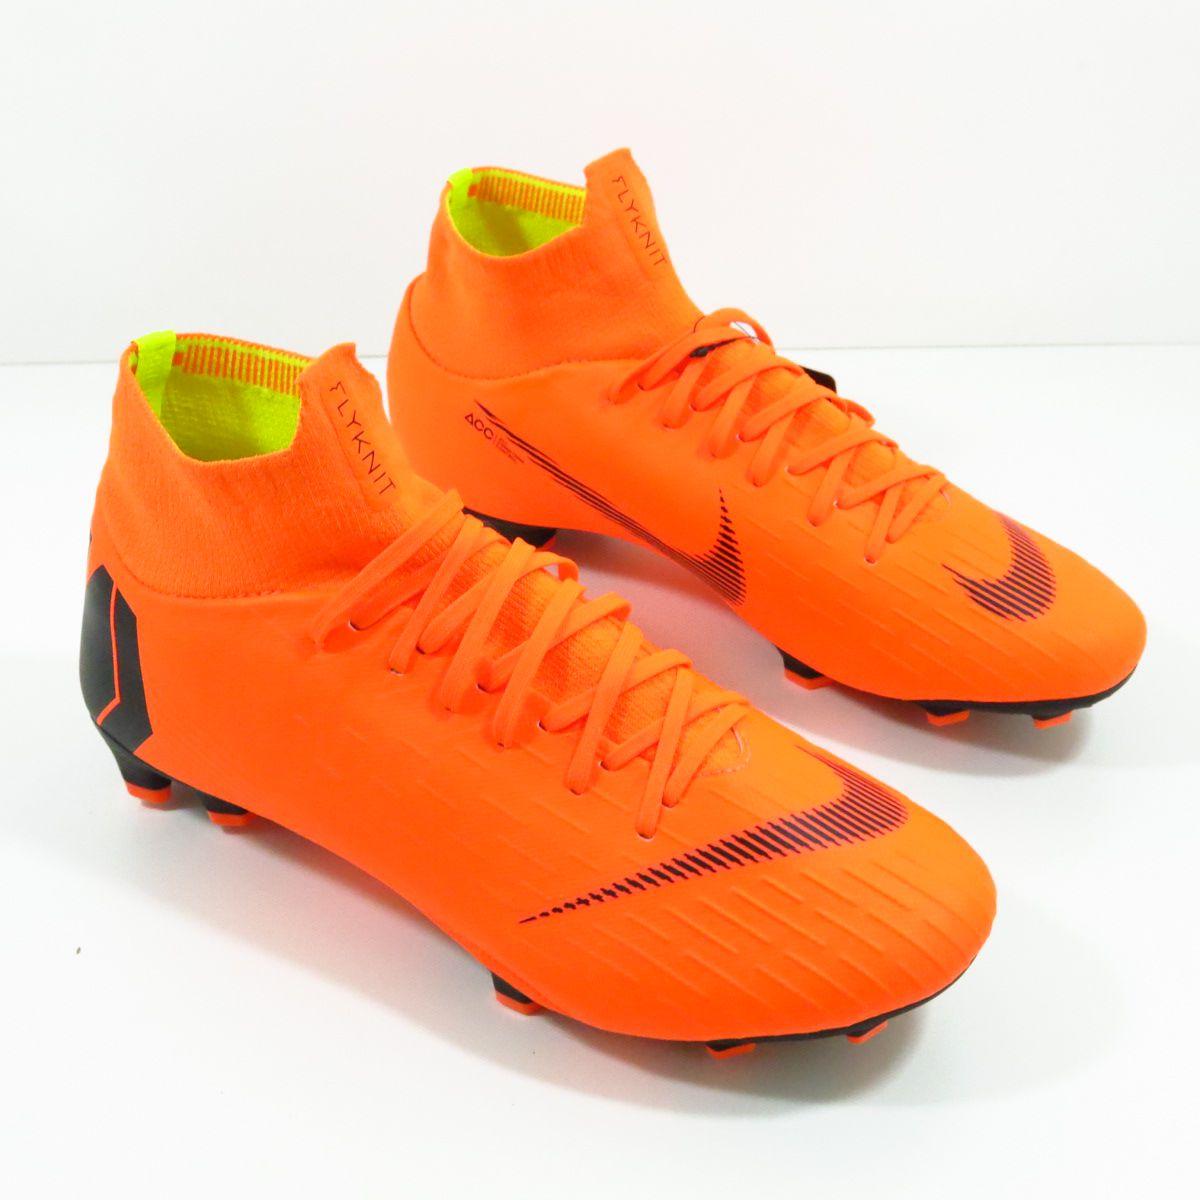 Chuteira Nike Mercurial Superfly Fg Pro